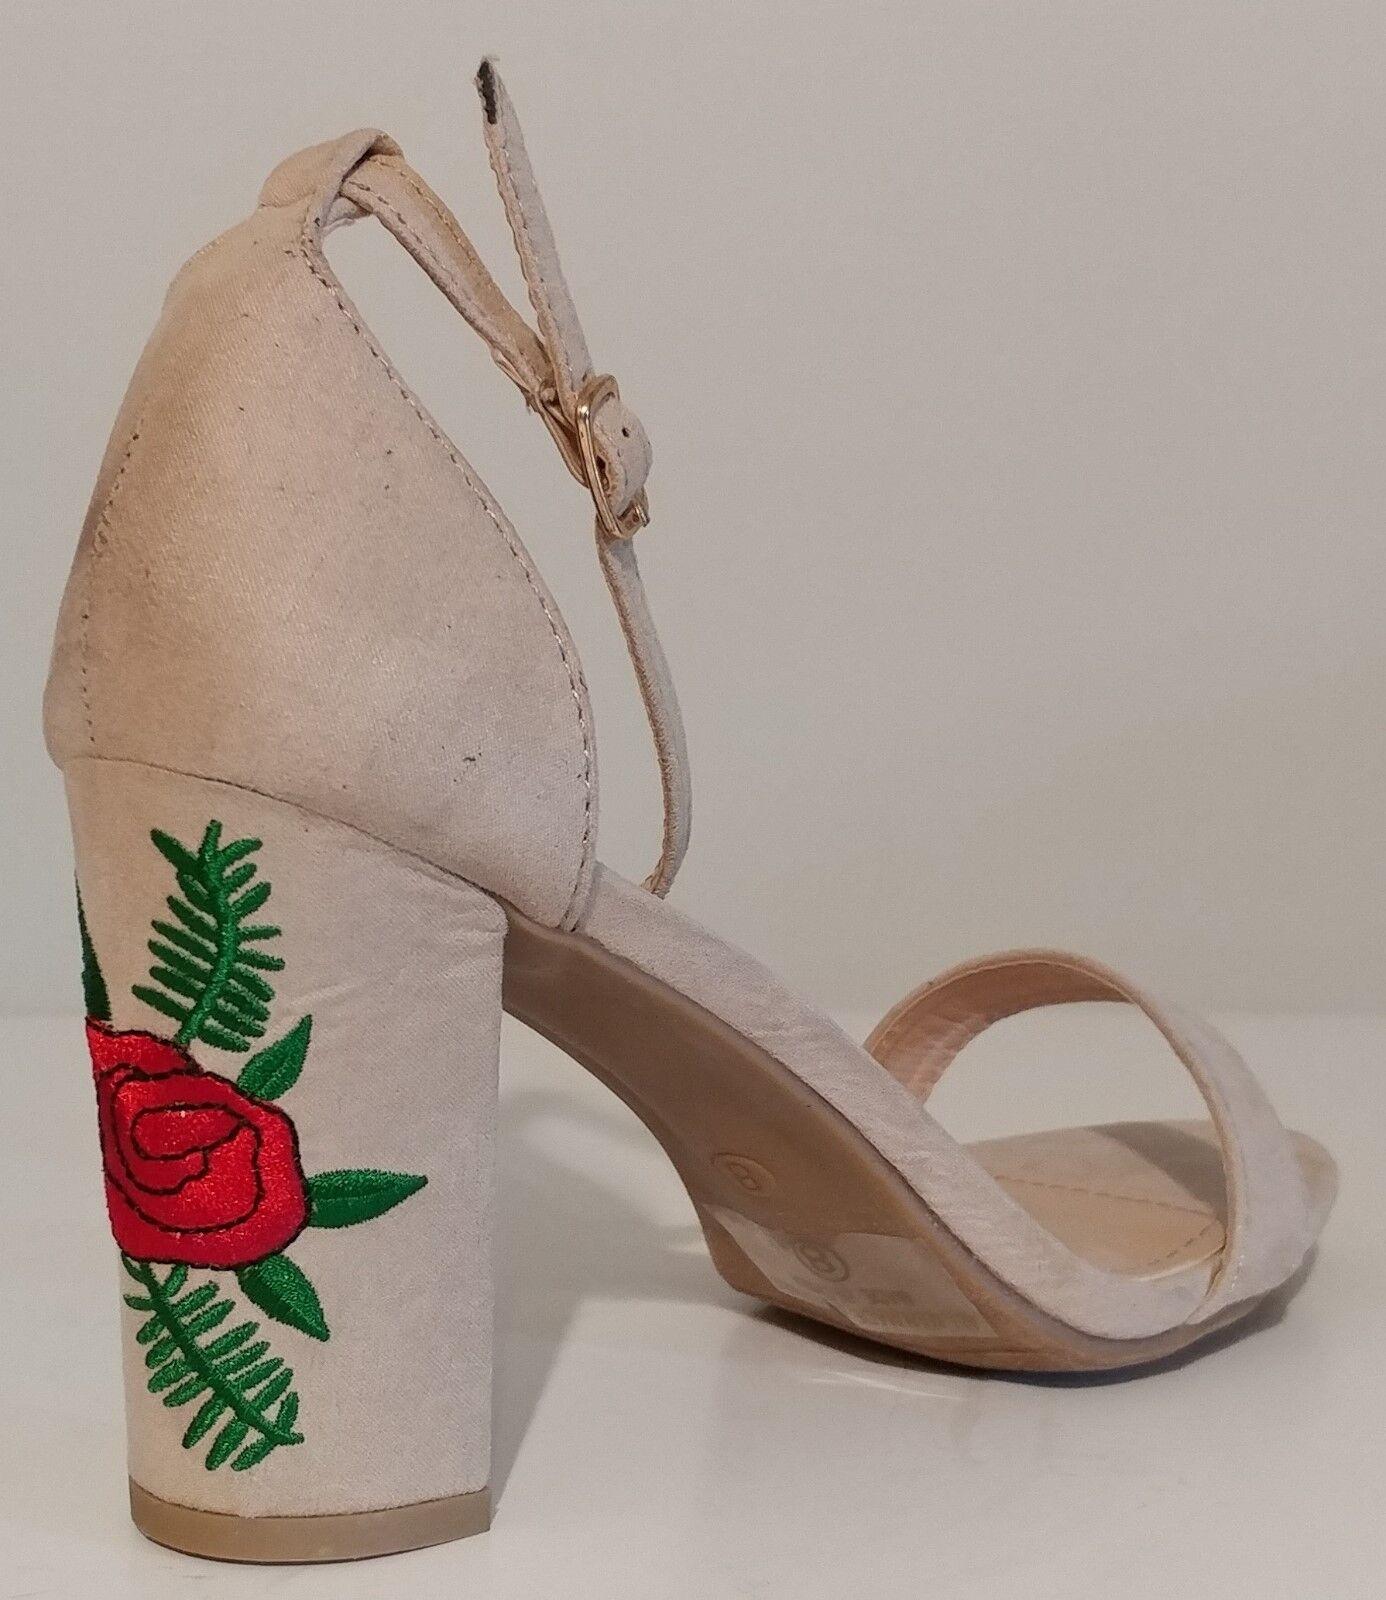 NEW NEW NEW Top Moda Beige EMbroiderot Rosa Sandals 3.5  Heels Größe 8M US 38M EUR ed6605